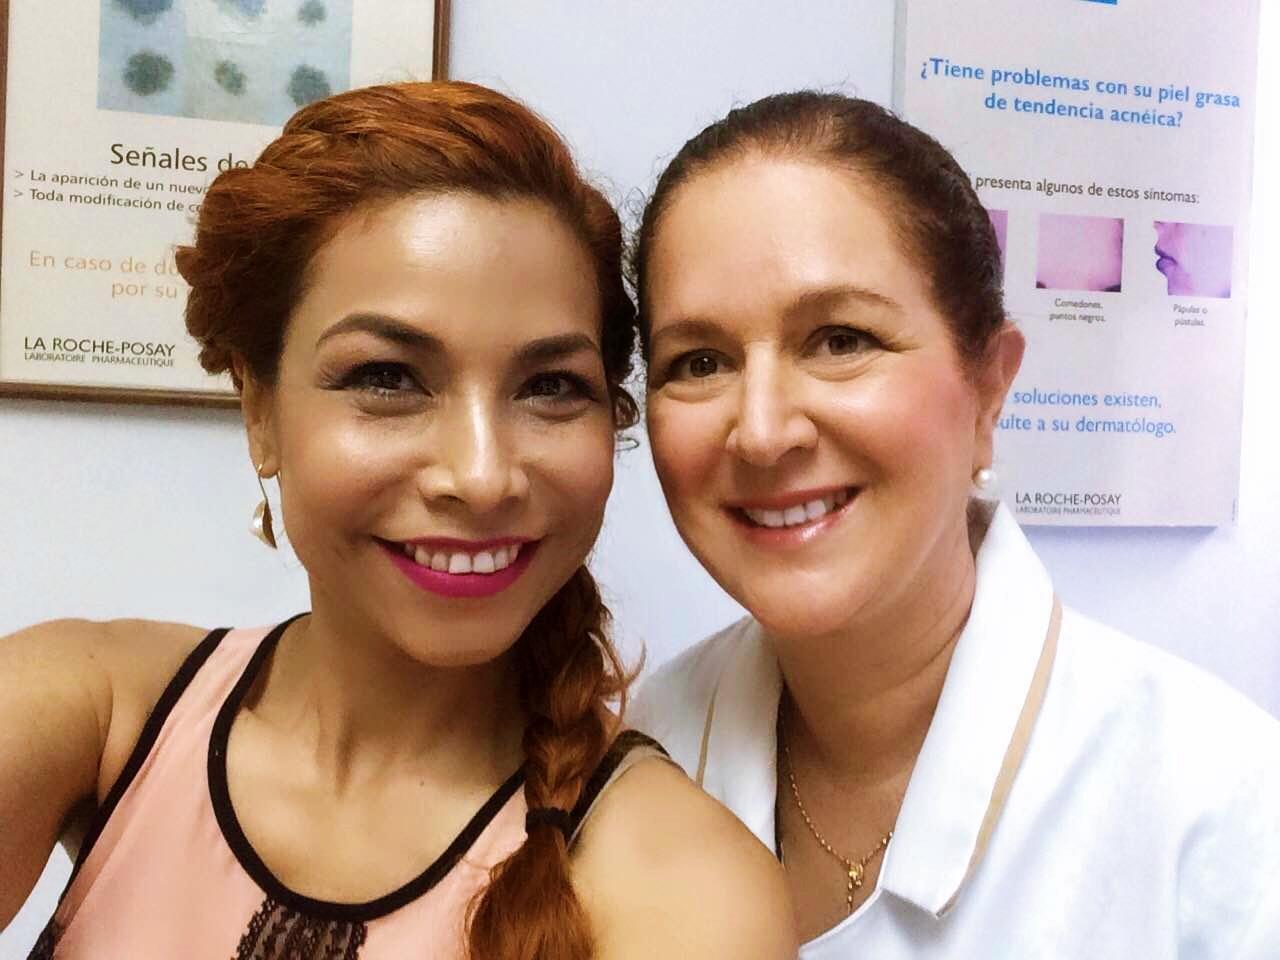 Experta en caída del cabello Dra Ranalli